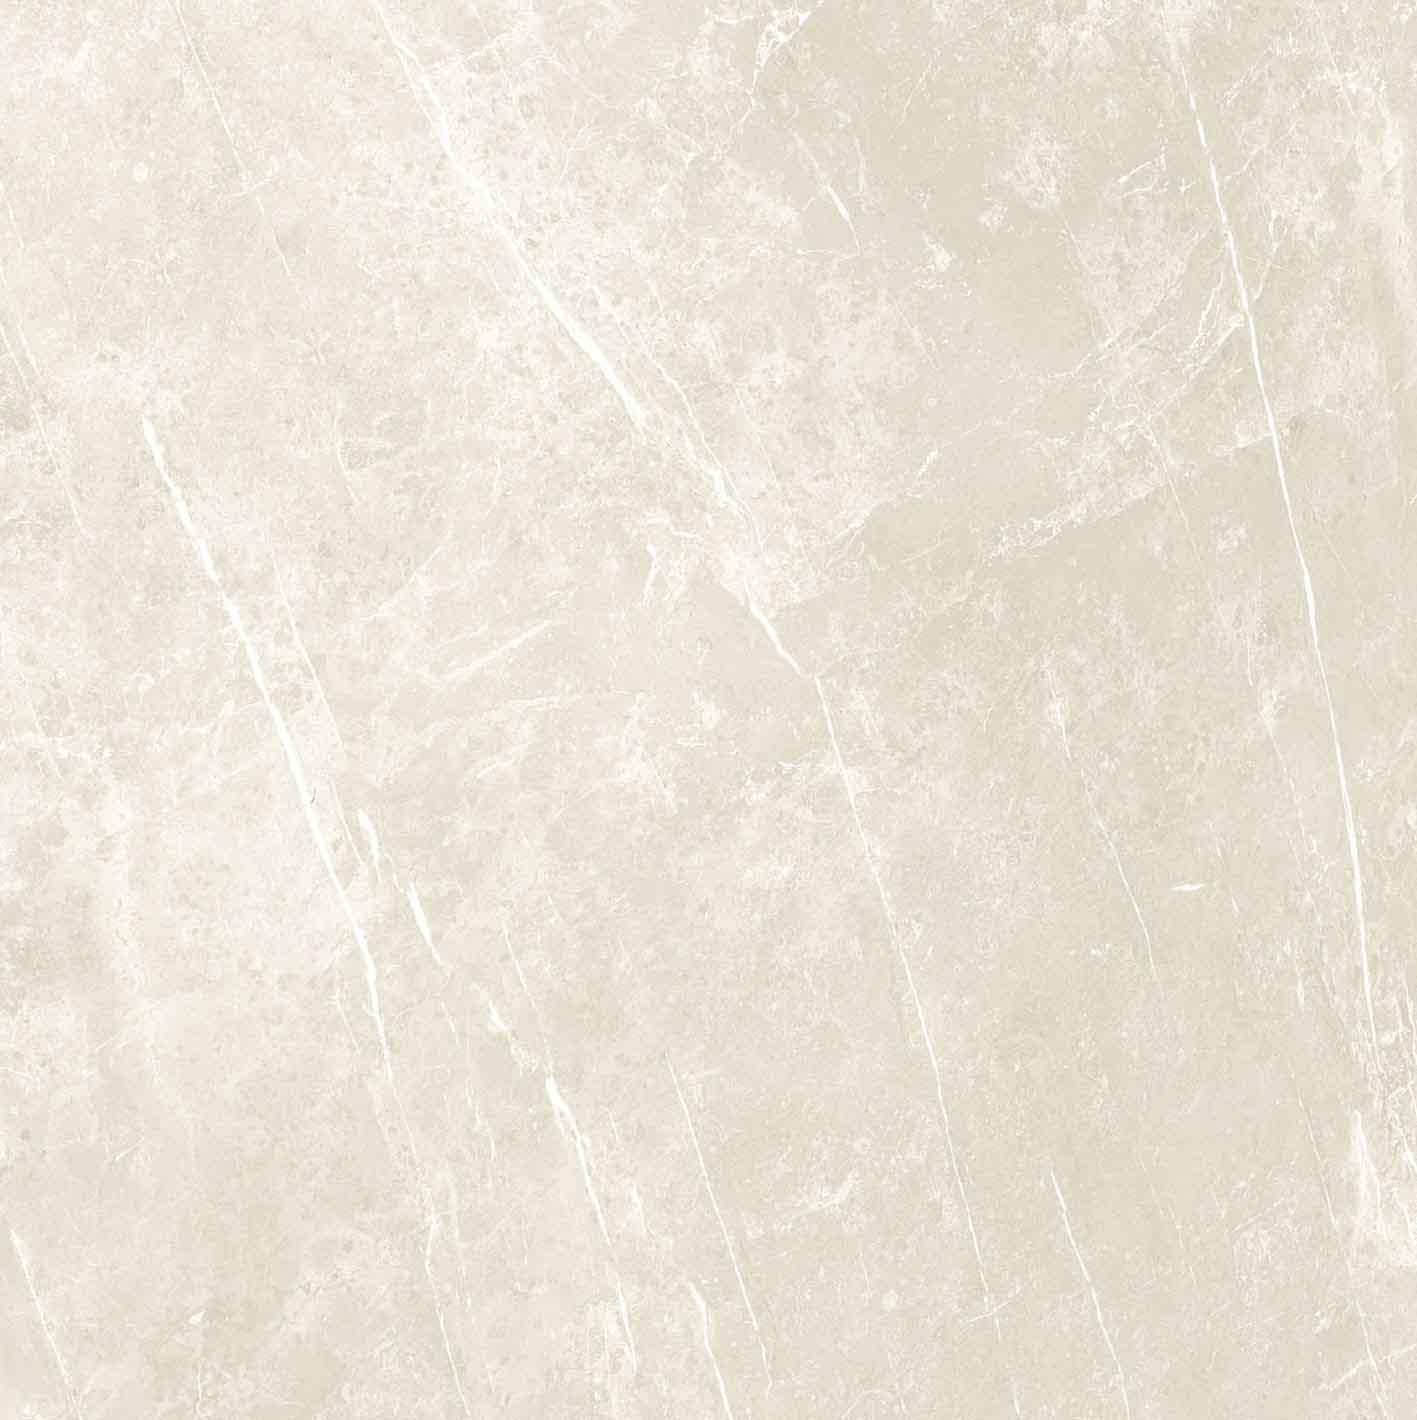 Elemental Stone Cream Dolomia Glossy 10mm 120 x 120